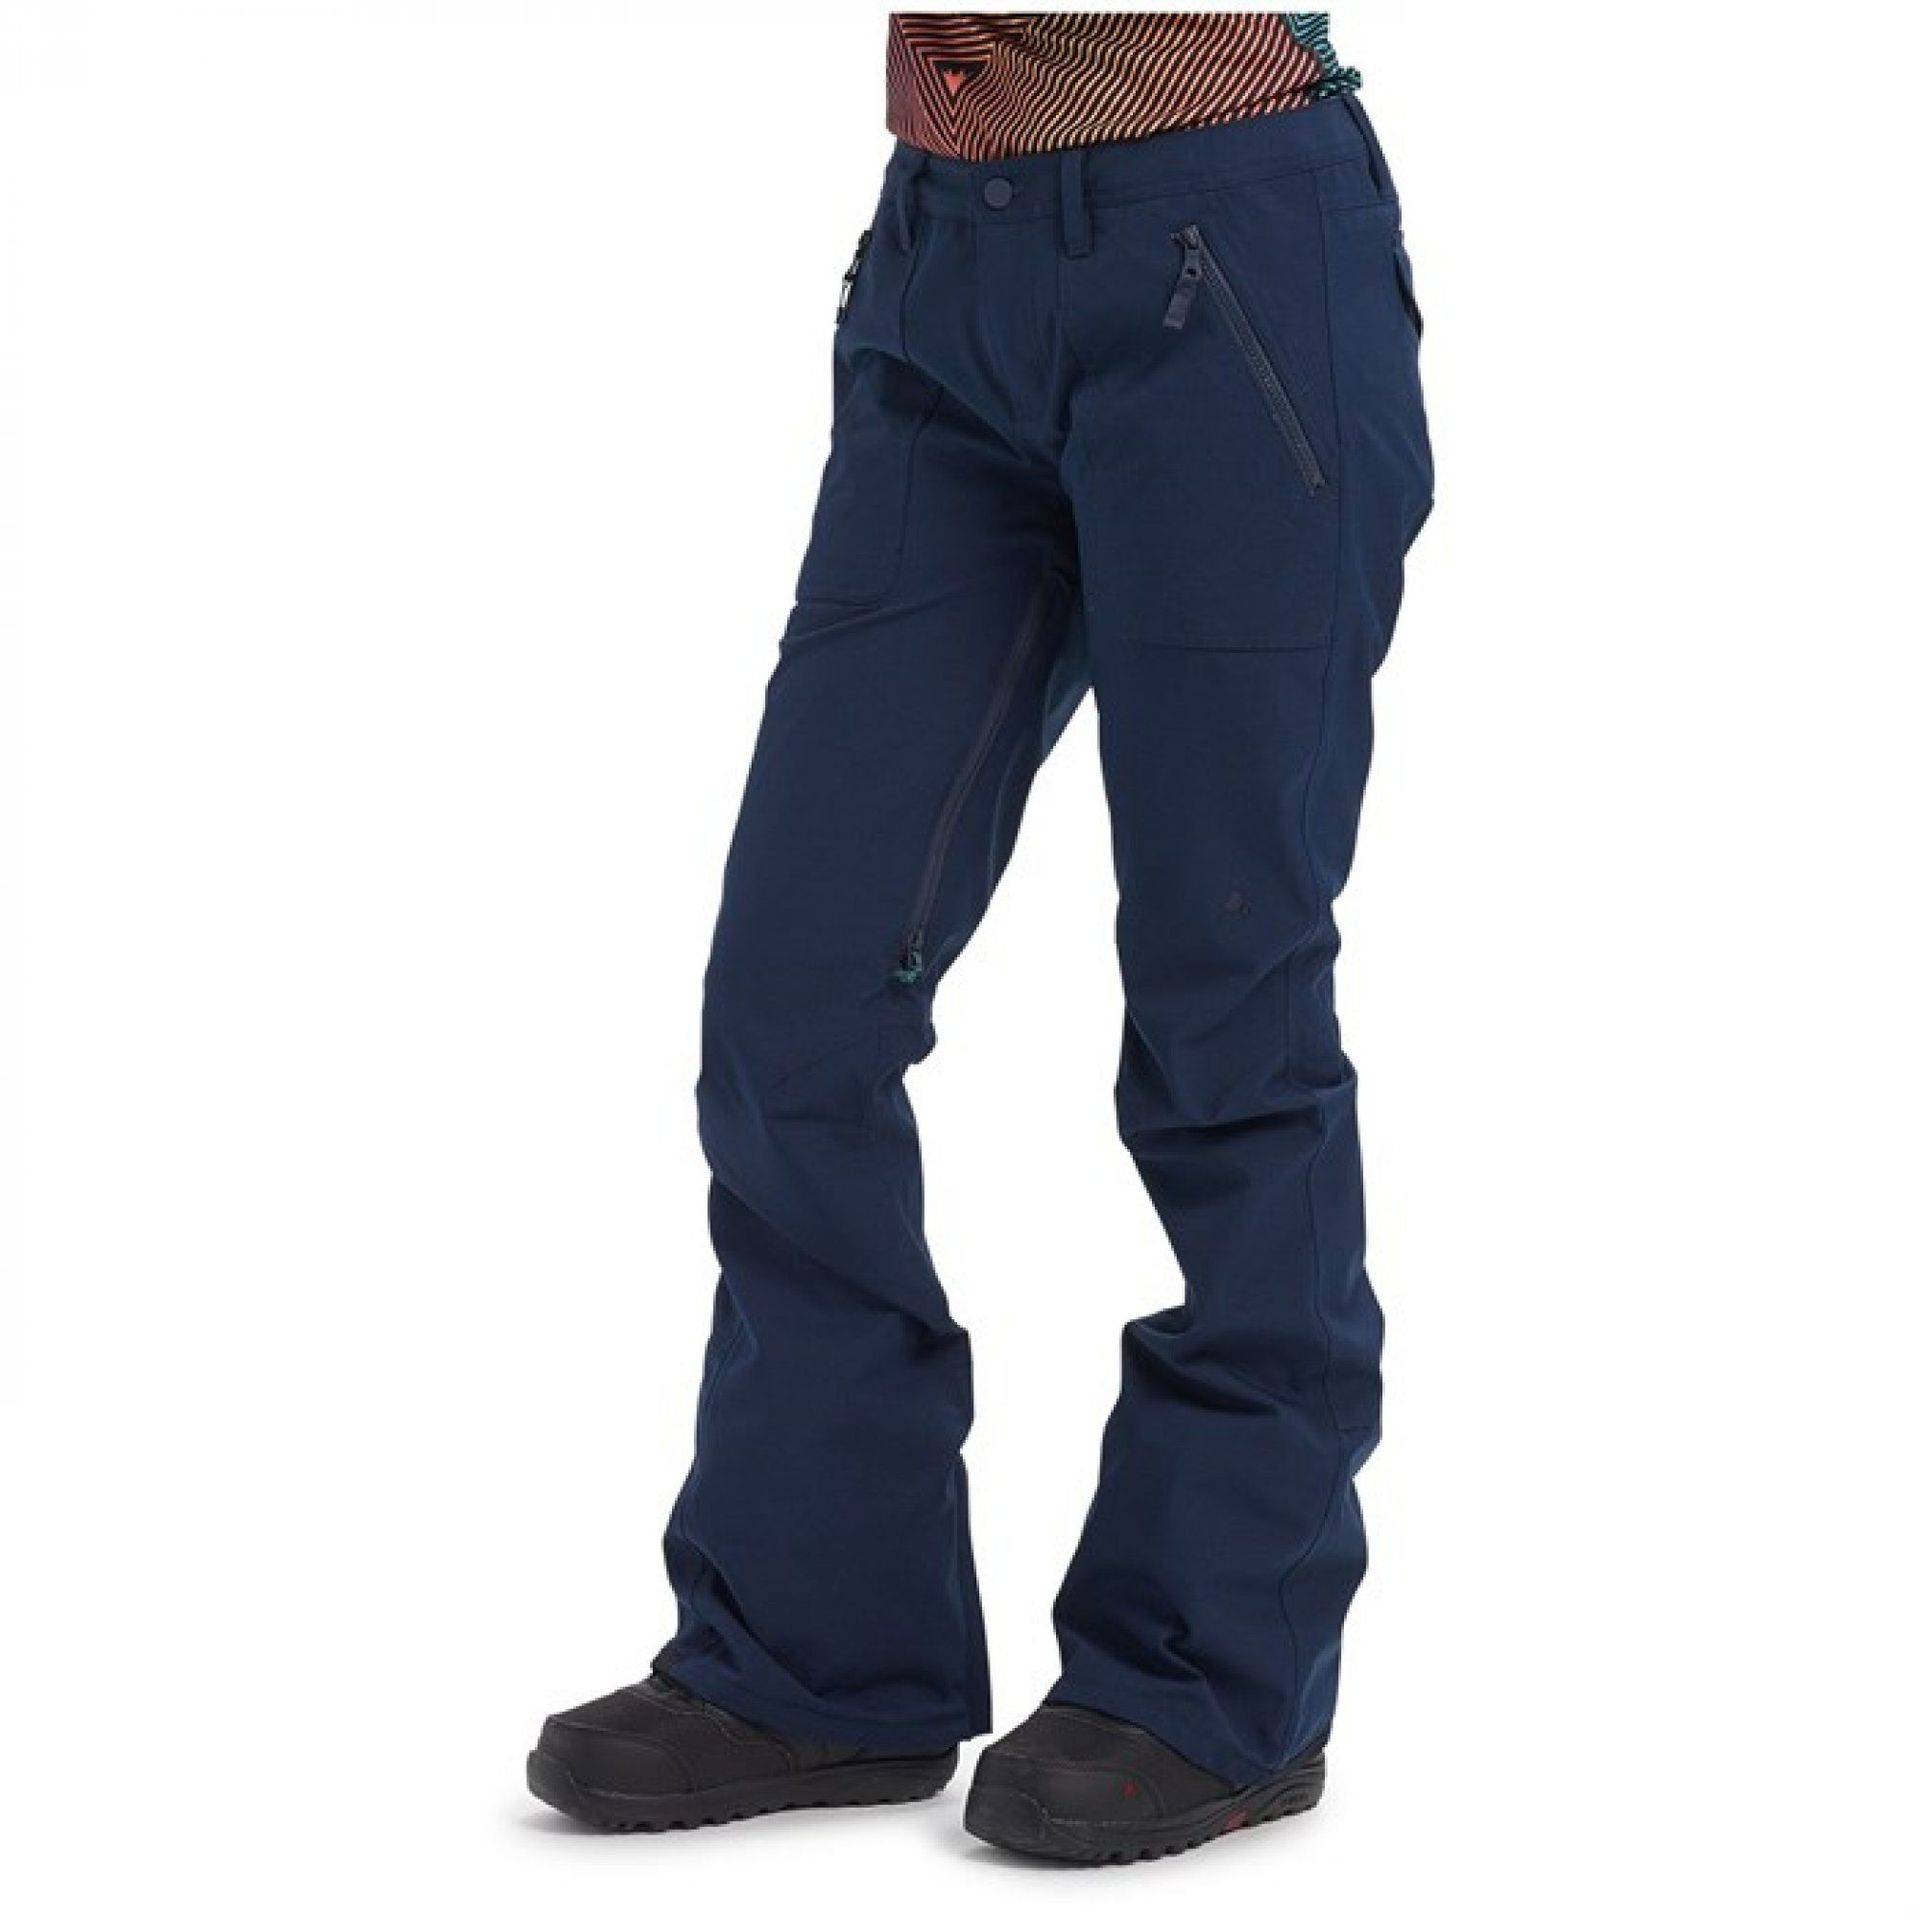 SPODNIE BURTON VIDA DRESS BLUE 150061 400 1